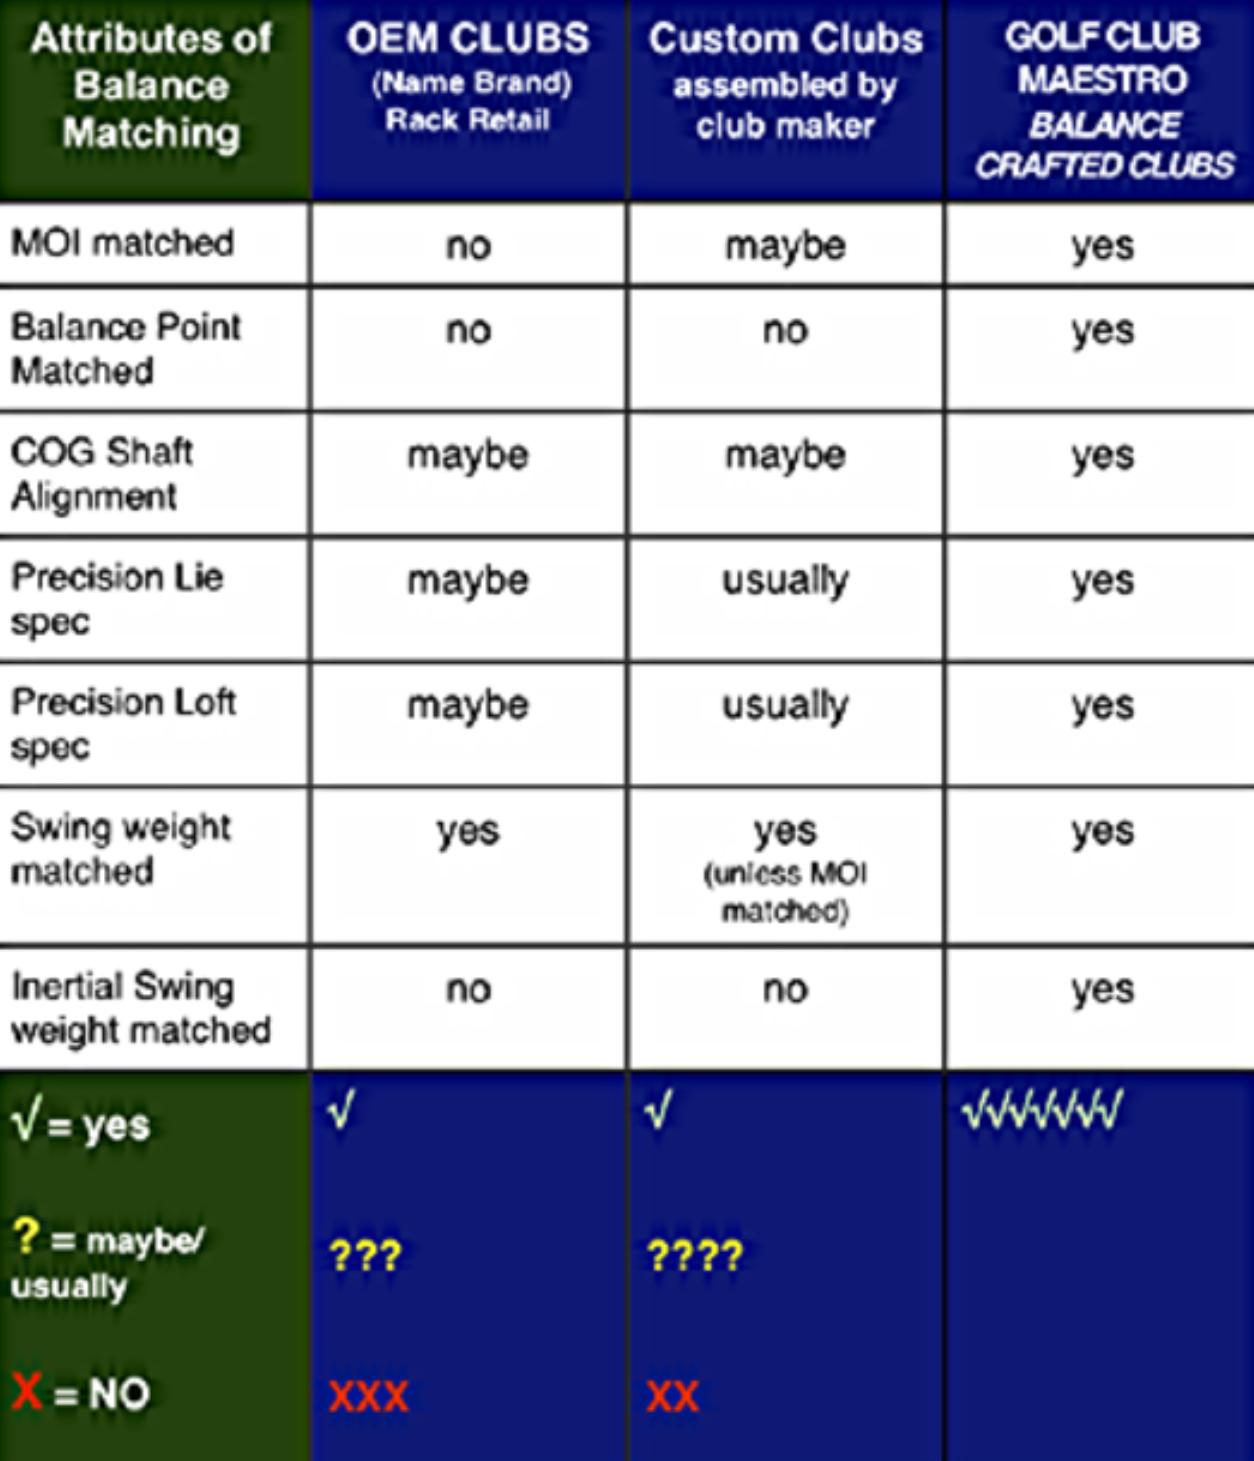 O.E.M vs Golf Club Maestro